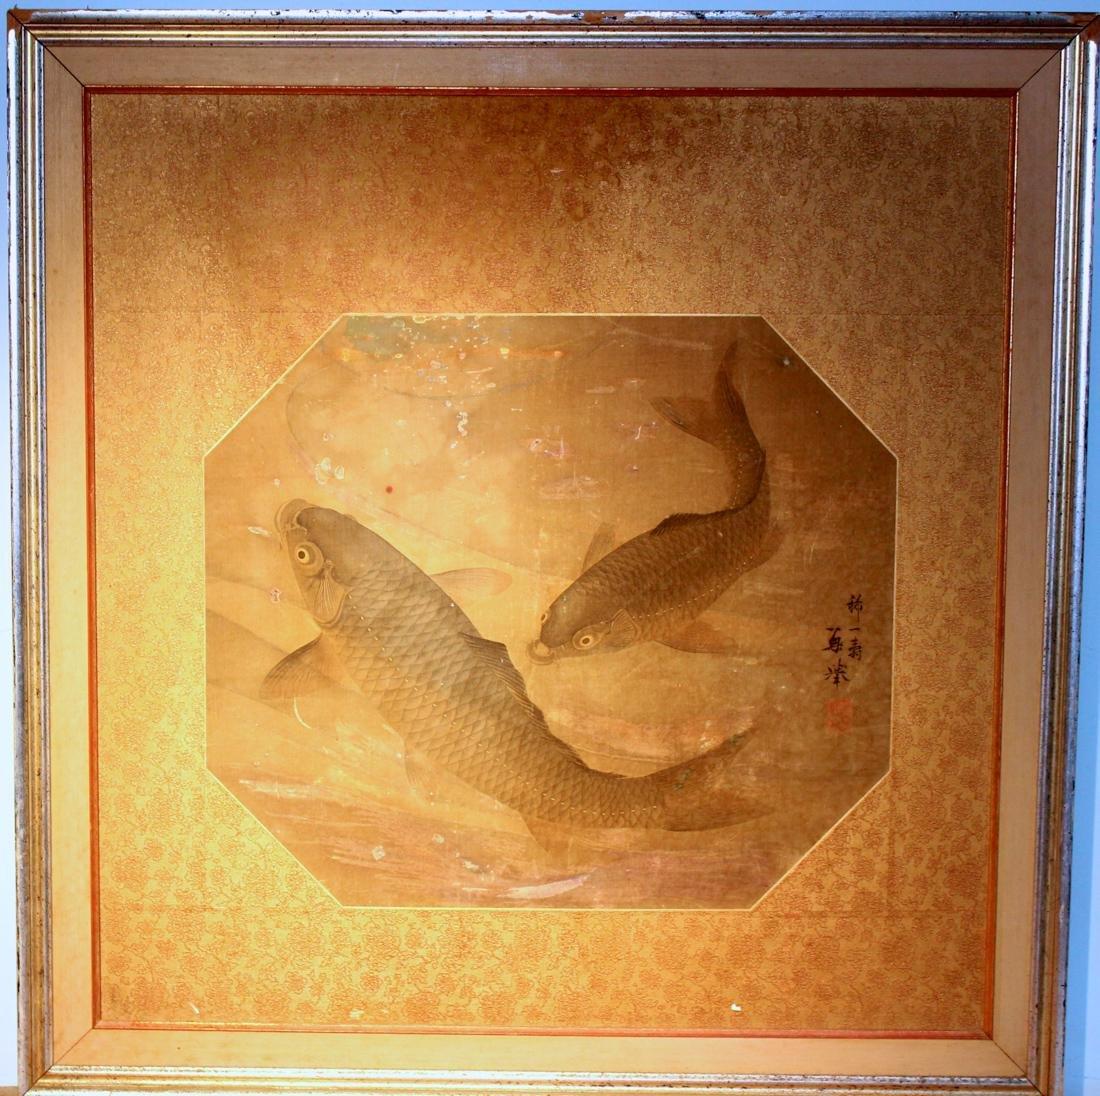 Chinese Painting of Carp - On Silk